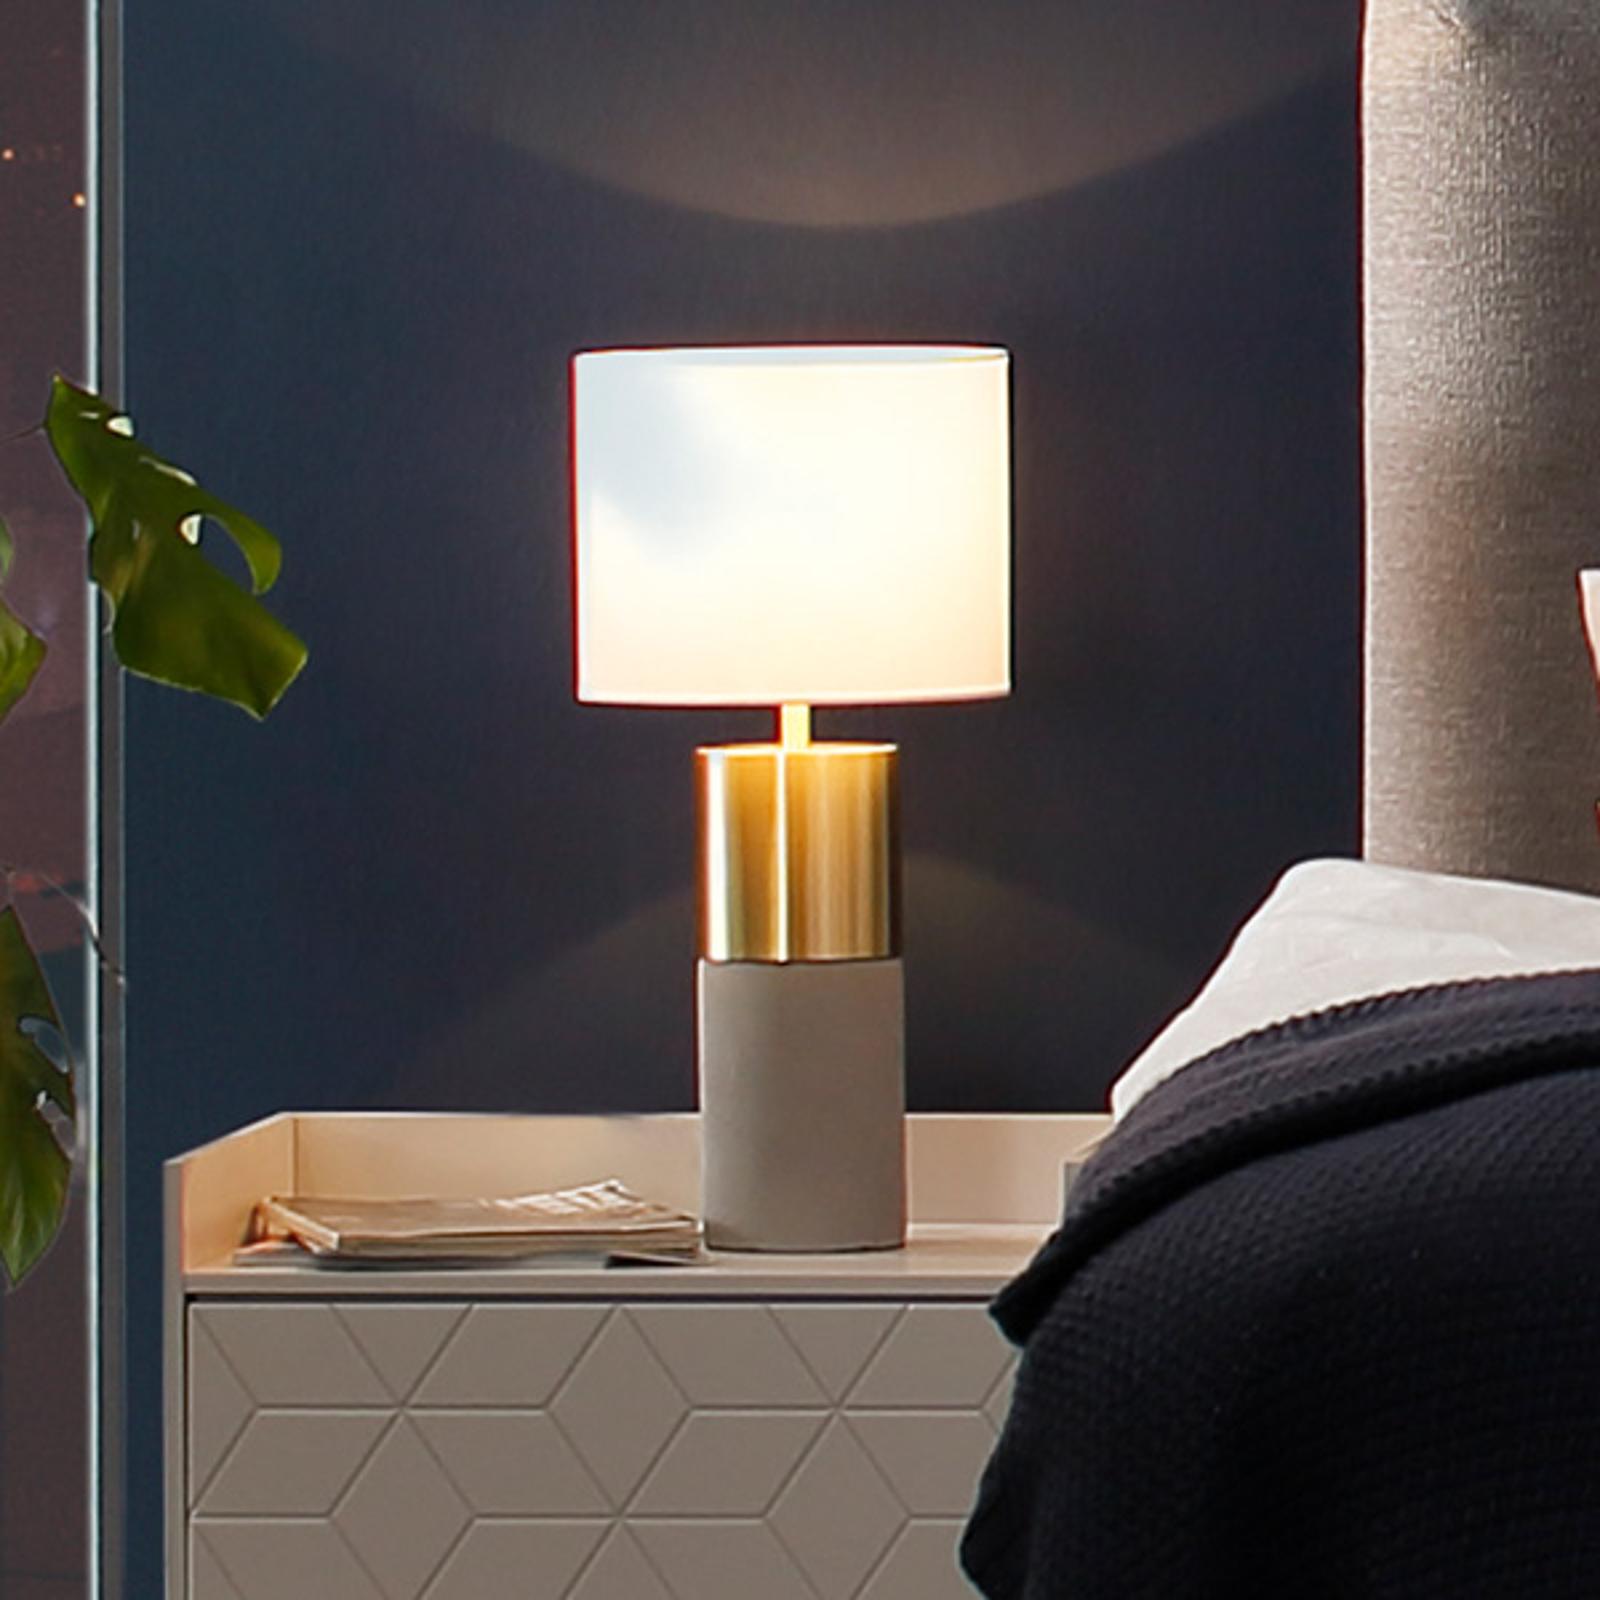 Villeroy & Boch Turin bordslampa betongoptik 33 cm